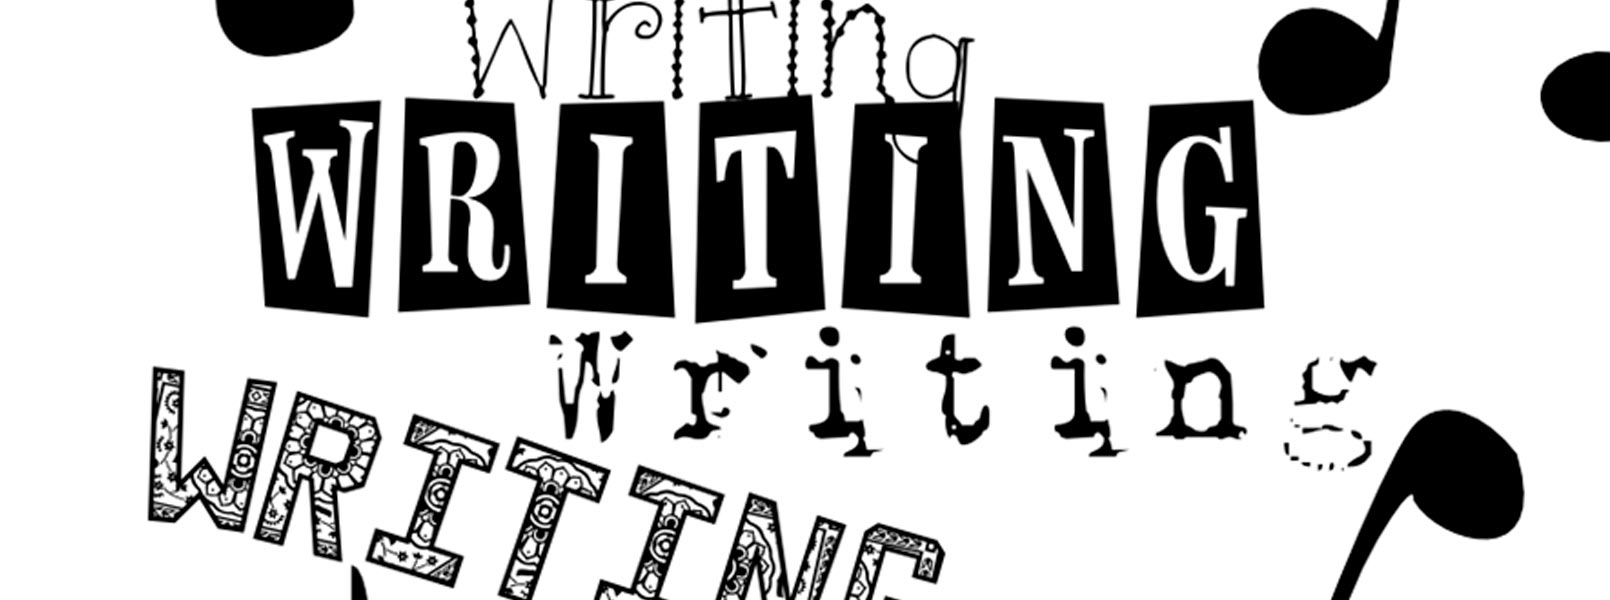 Writing_W.jpg